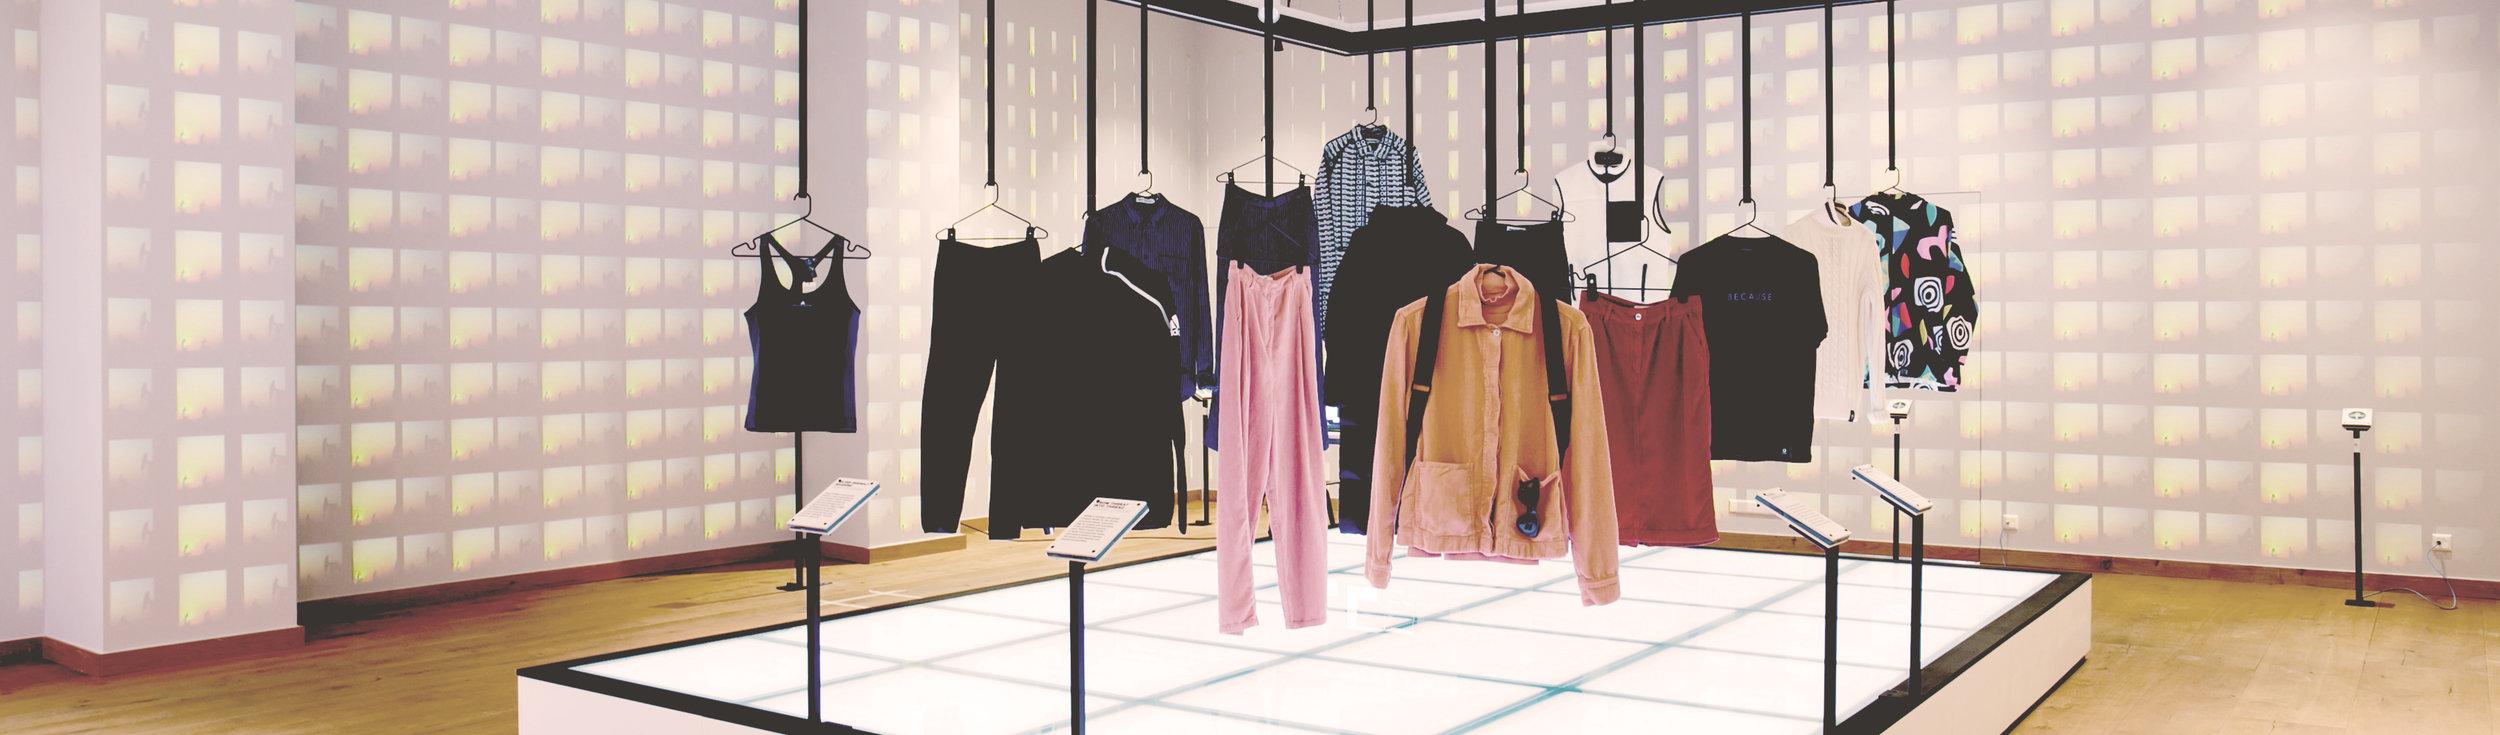 Good Shop High Res presstigieux 3_smal.jpg